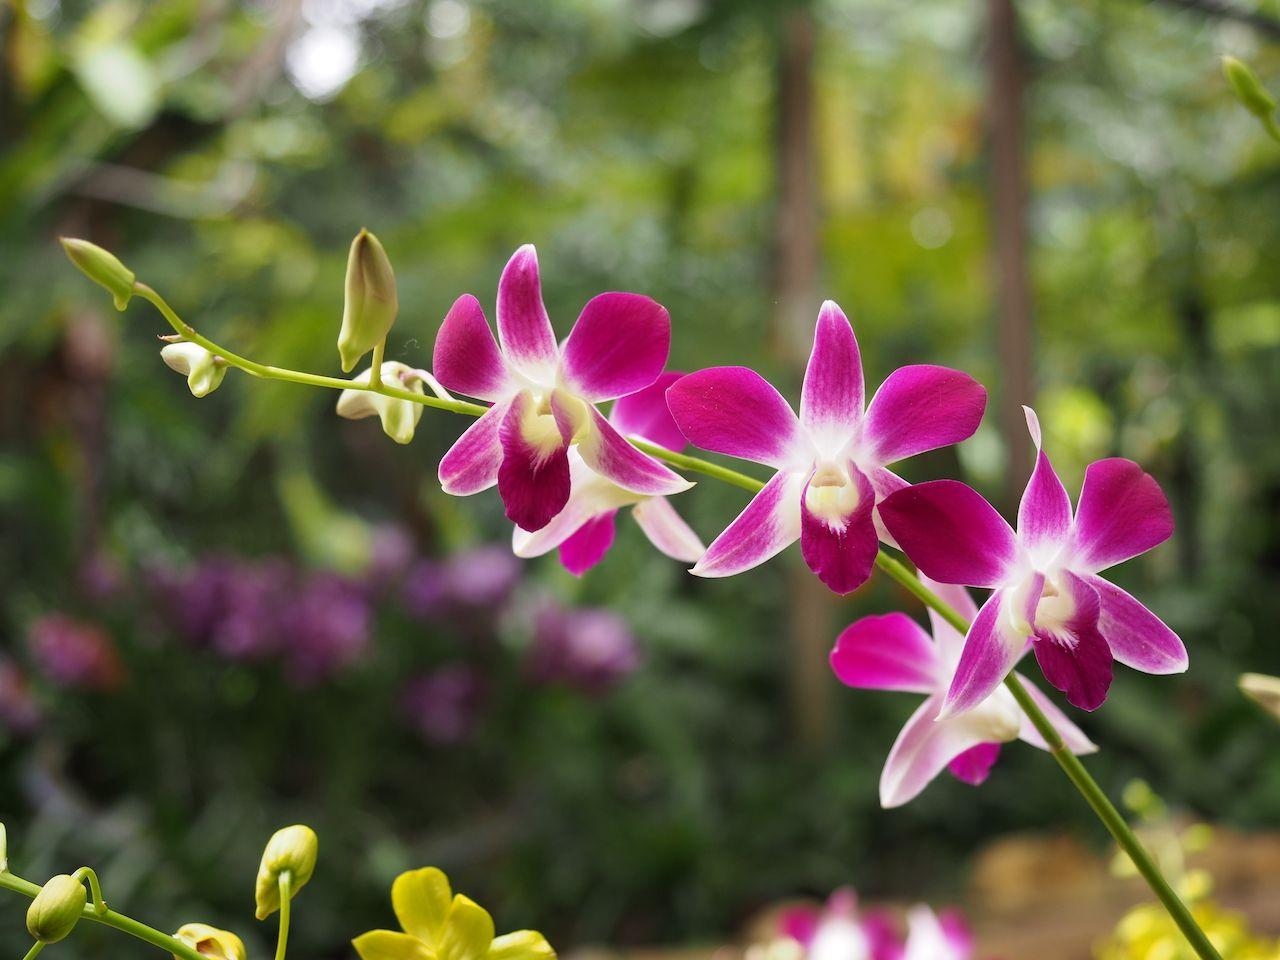 Pink orchid at the Perdana Botanical Garden, Kuala Lumpur, Malaysia